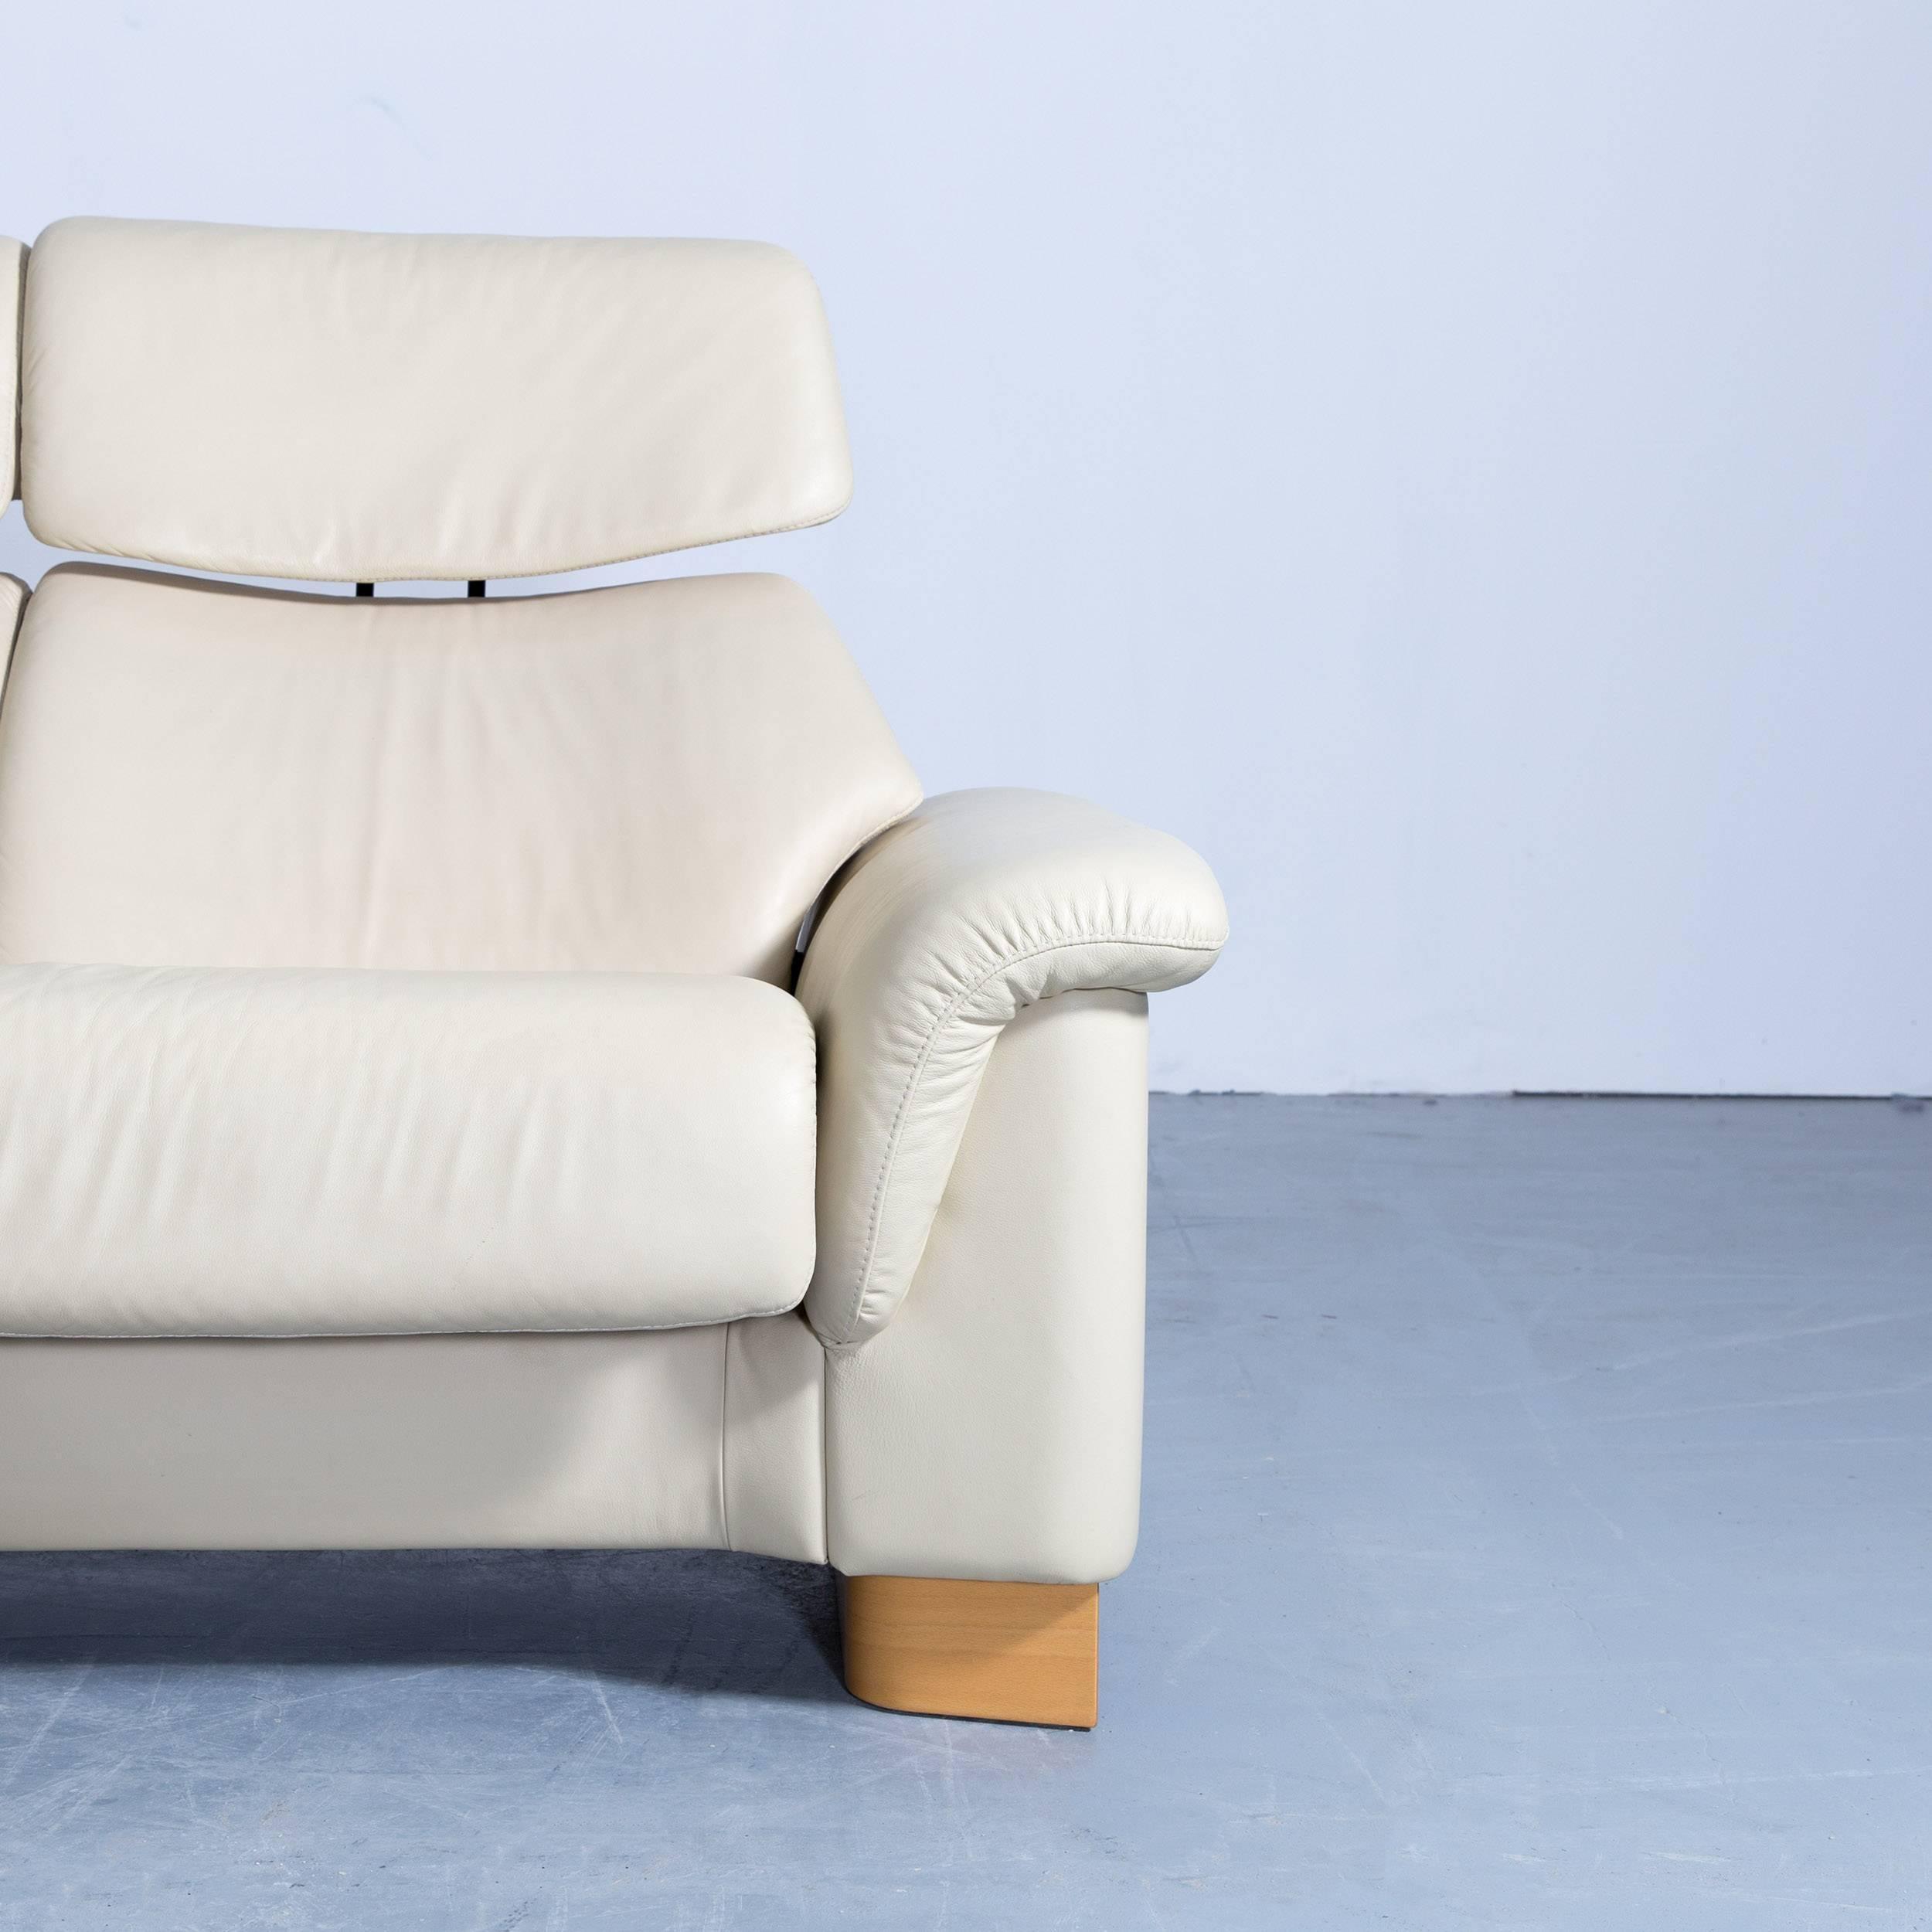 Großzügig Astonishing Stressless Sessel Gebraucht Fotos - Heimat ...